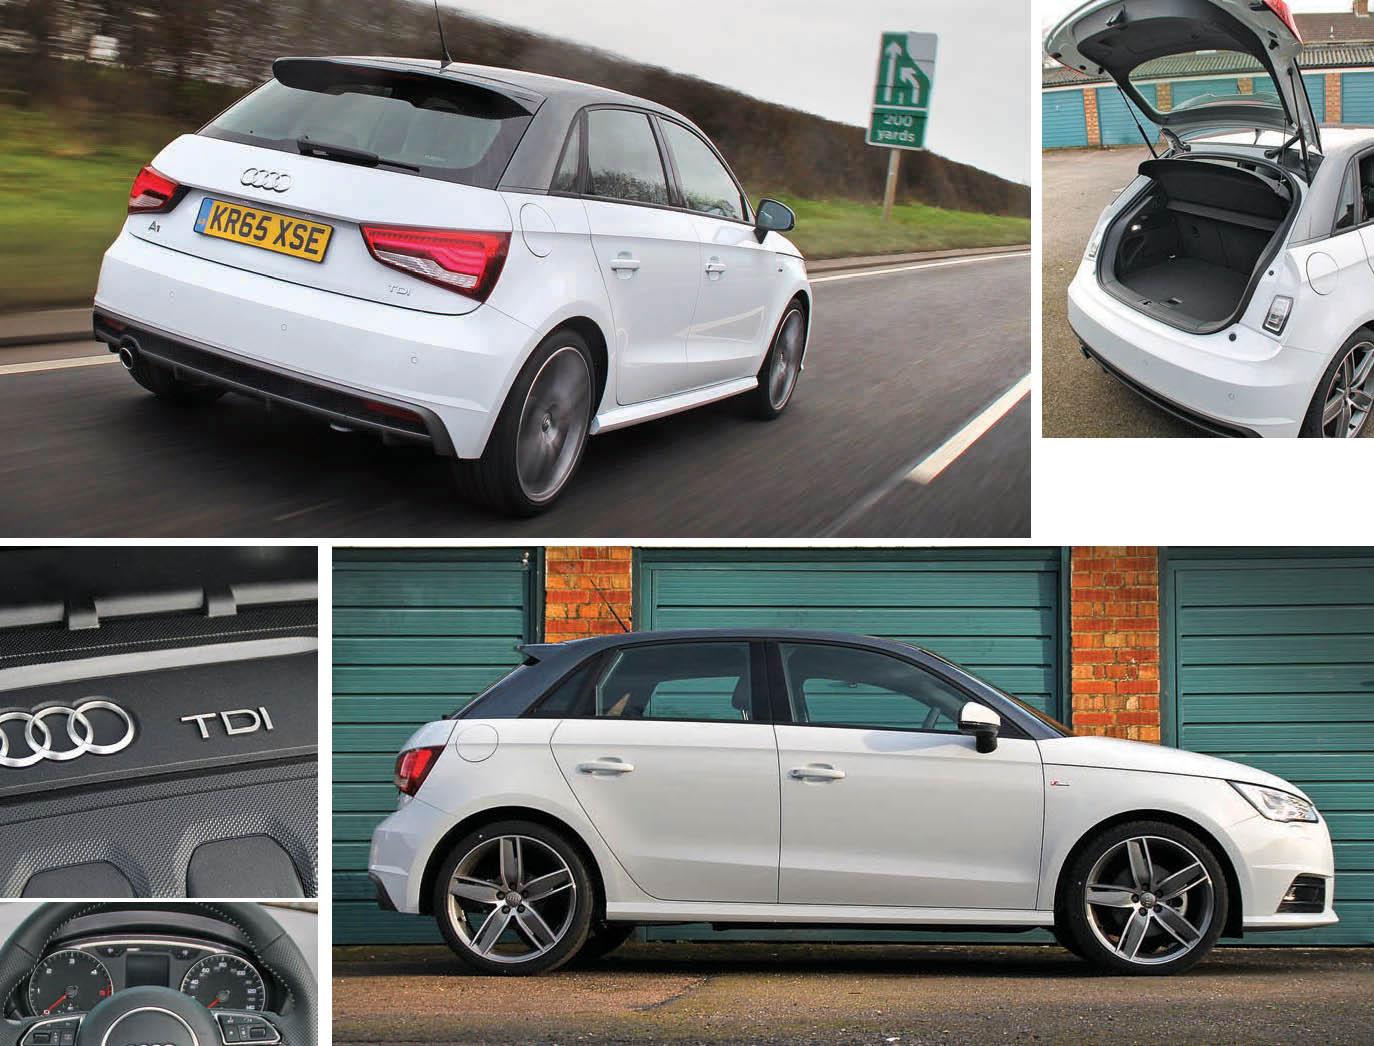 Road test – 2016 Audi A1 Sportback 1.6 TDI 116 PS S line S tronic